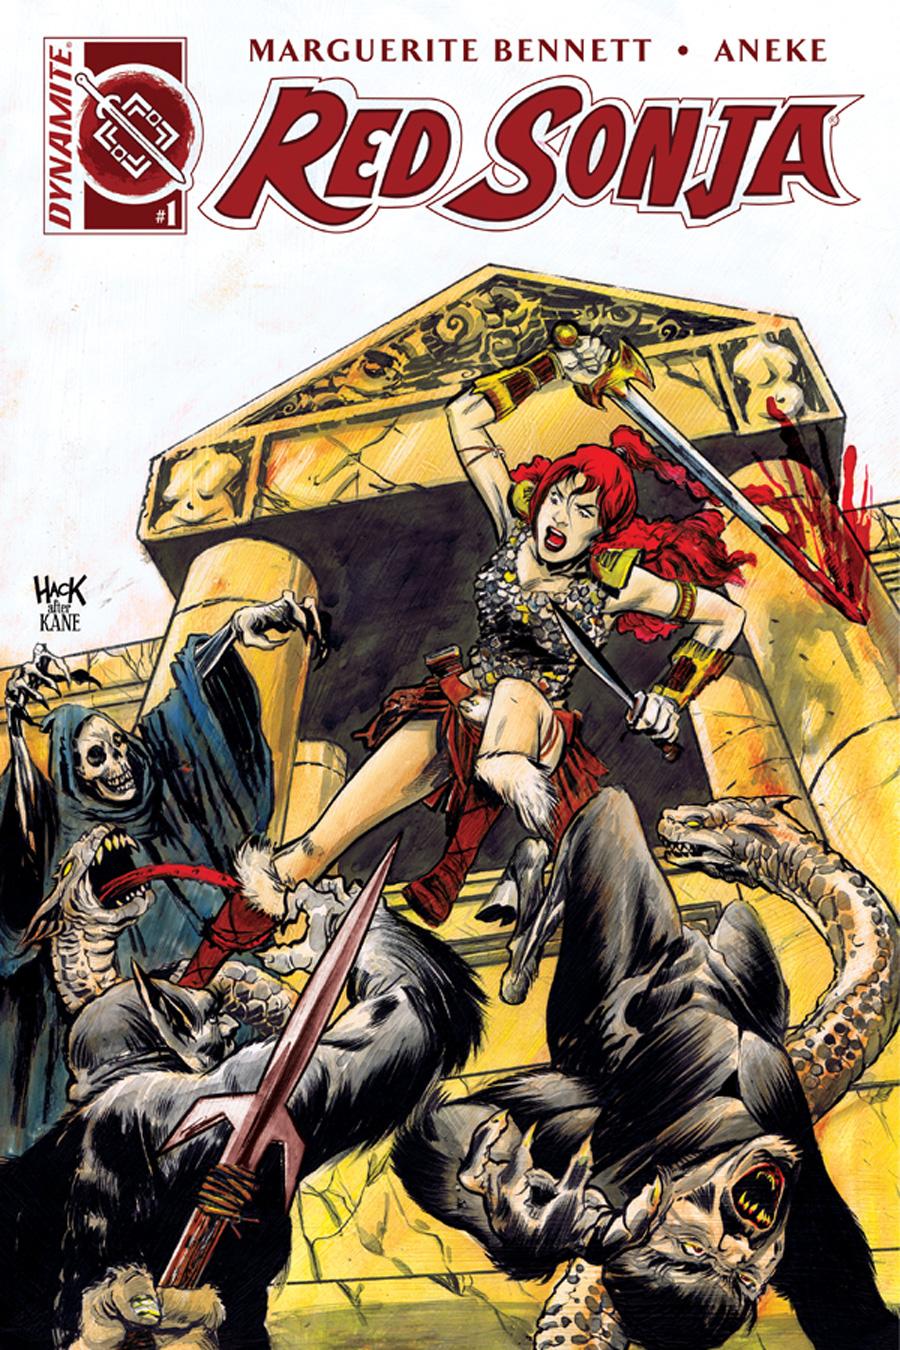 Red Sonja #1 Retailer Incentive Cover: Robert Hack